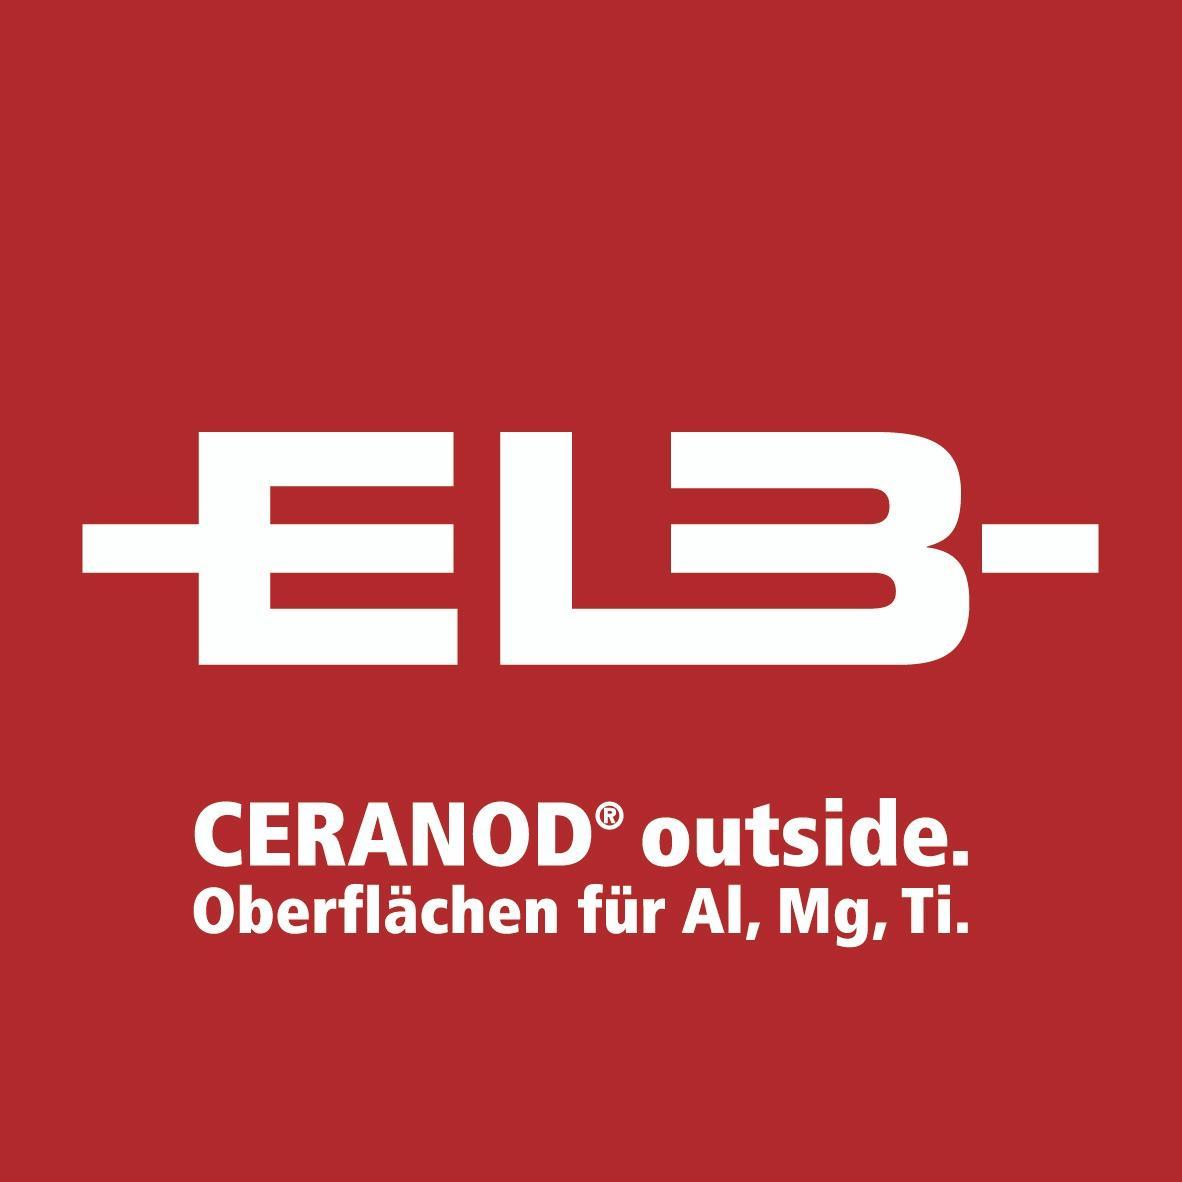 Bild zu ELB - Eloxalwerk Ludwigsburg Helmut Zerrer GmbH in Ludwigsburg in Württemberg